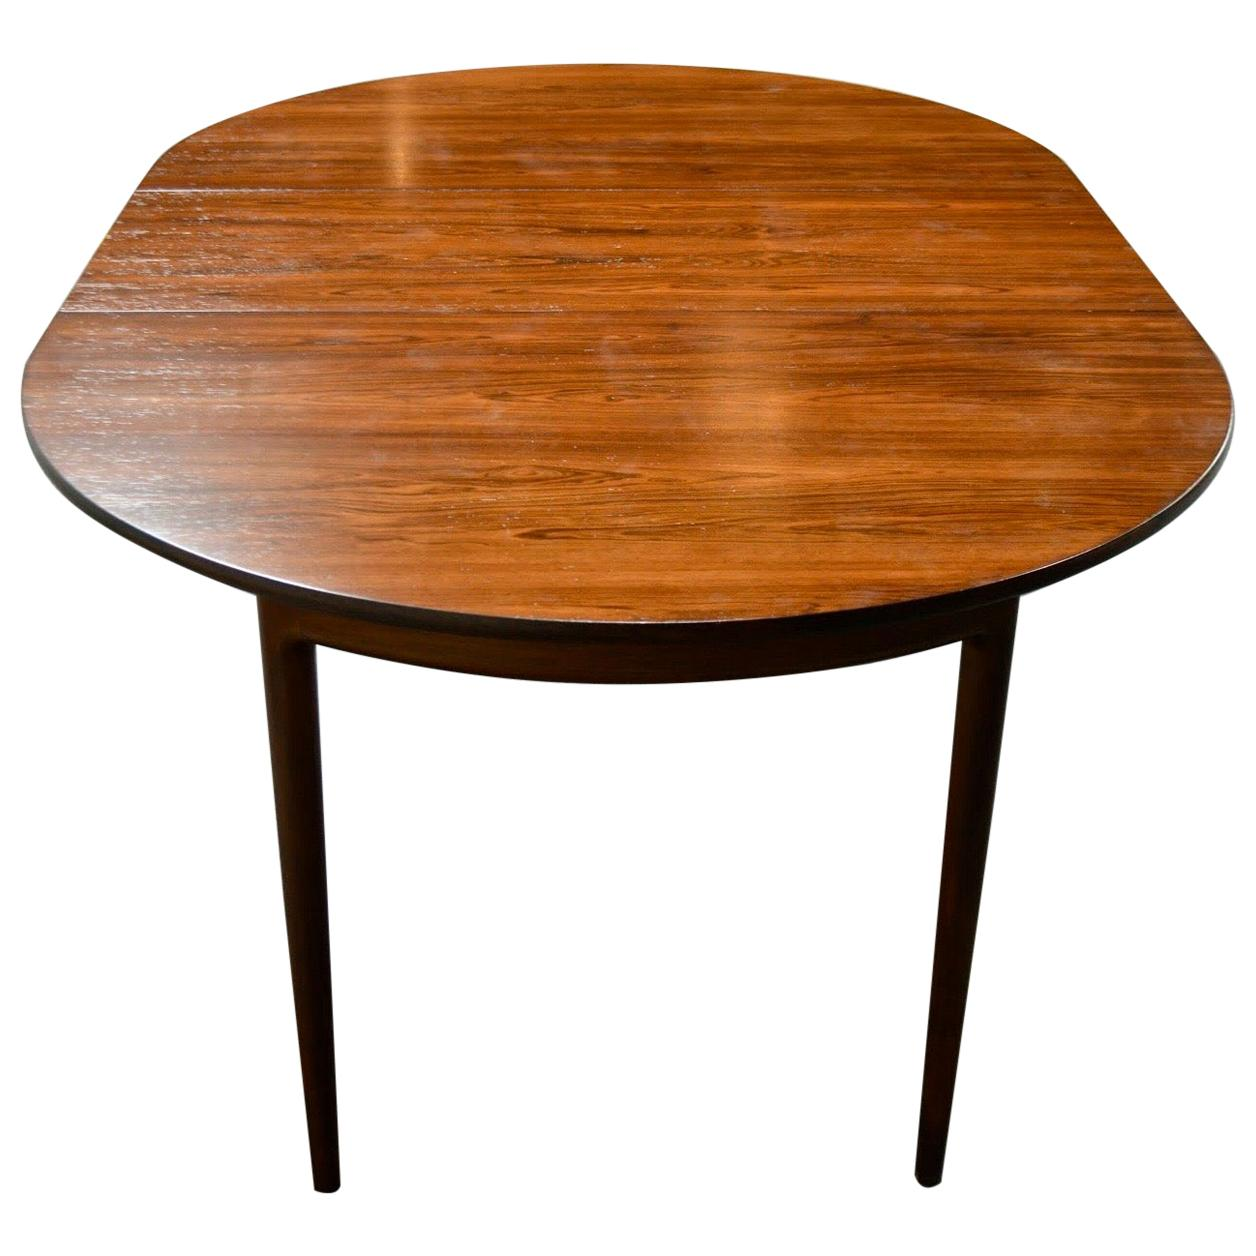 Danish Mid-Century Modern Jacaranda Extension Dining Table